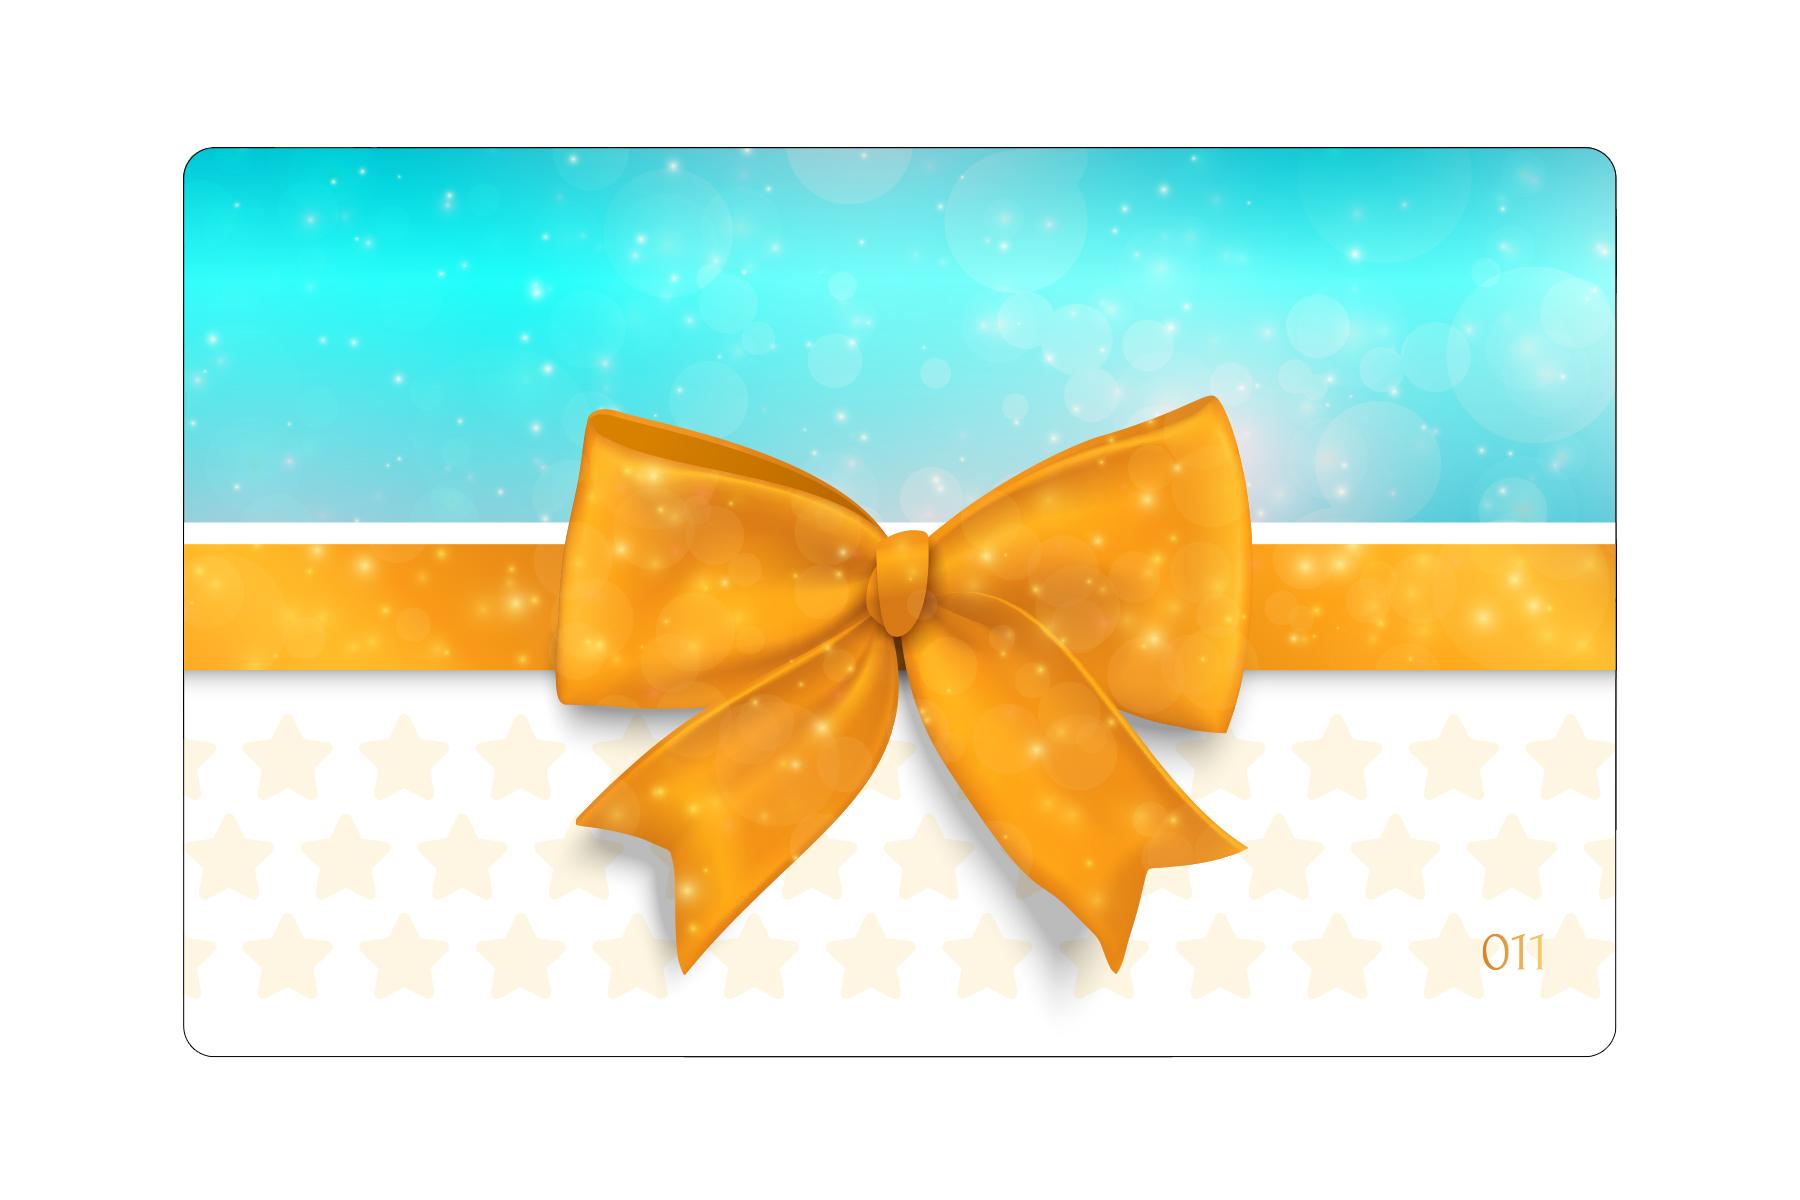 certificado de regalo clinica optica chitre